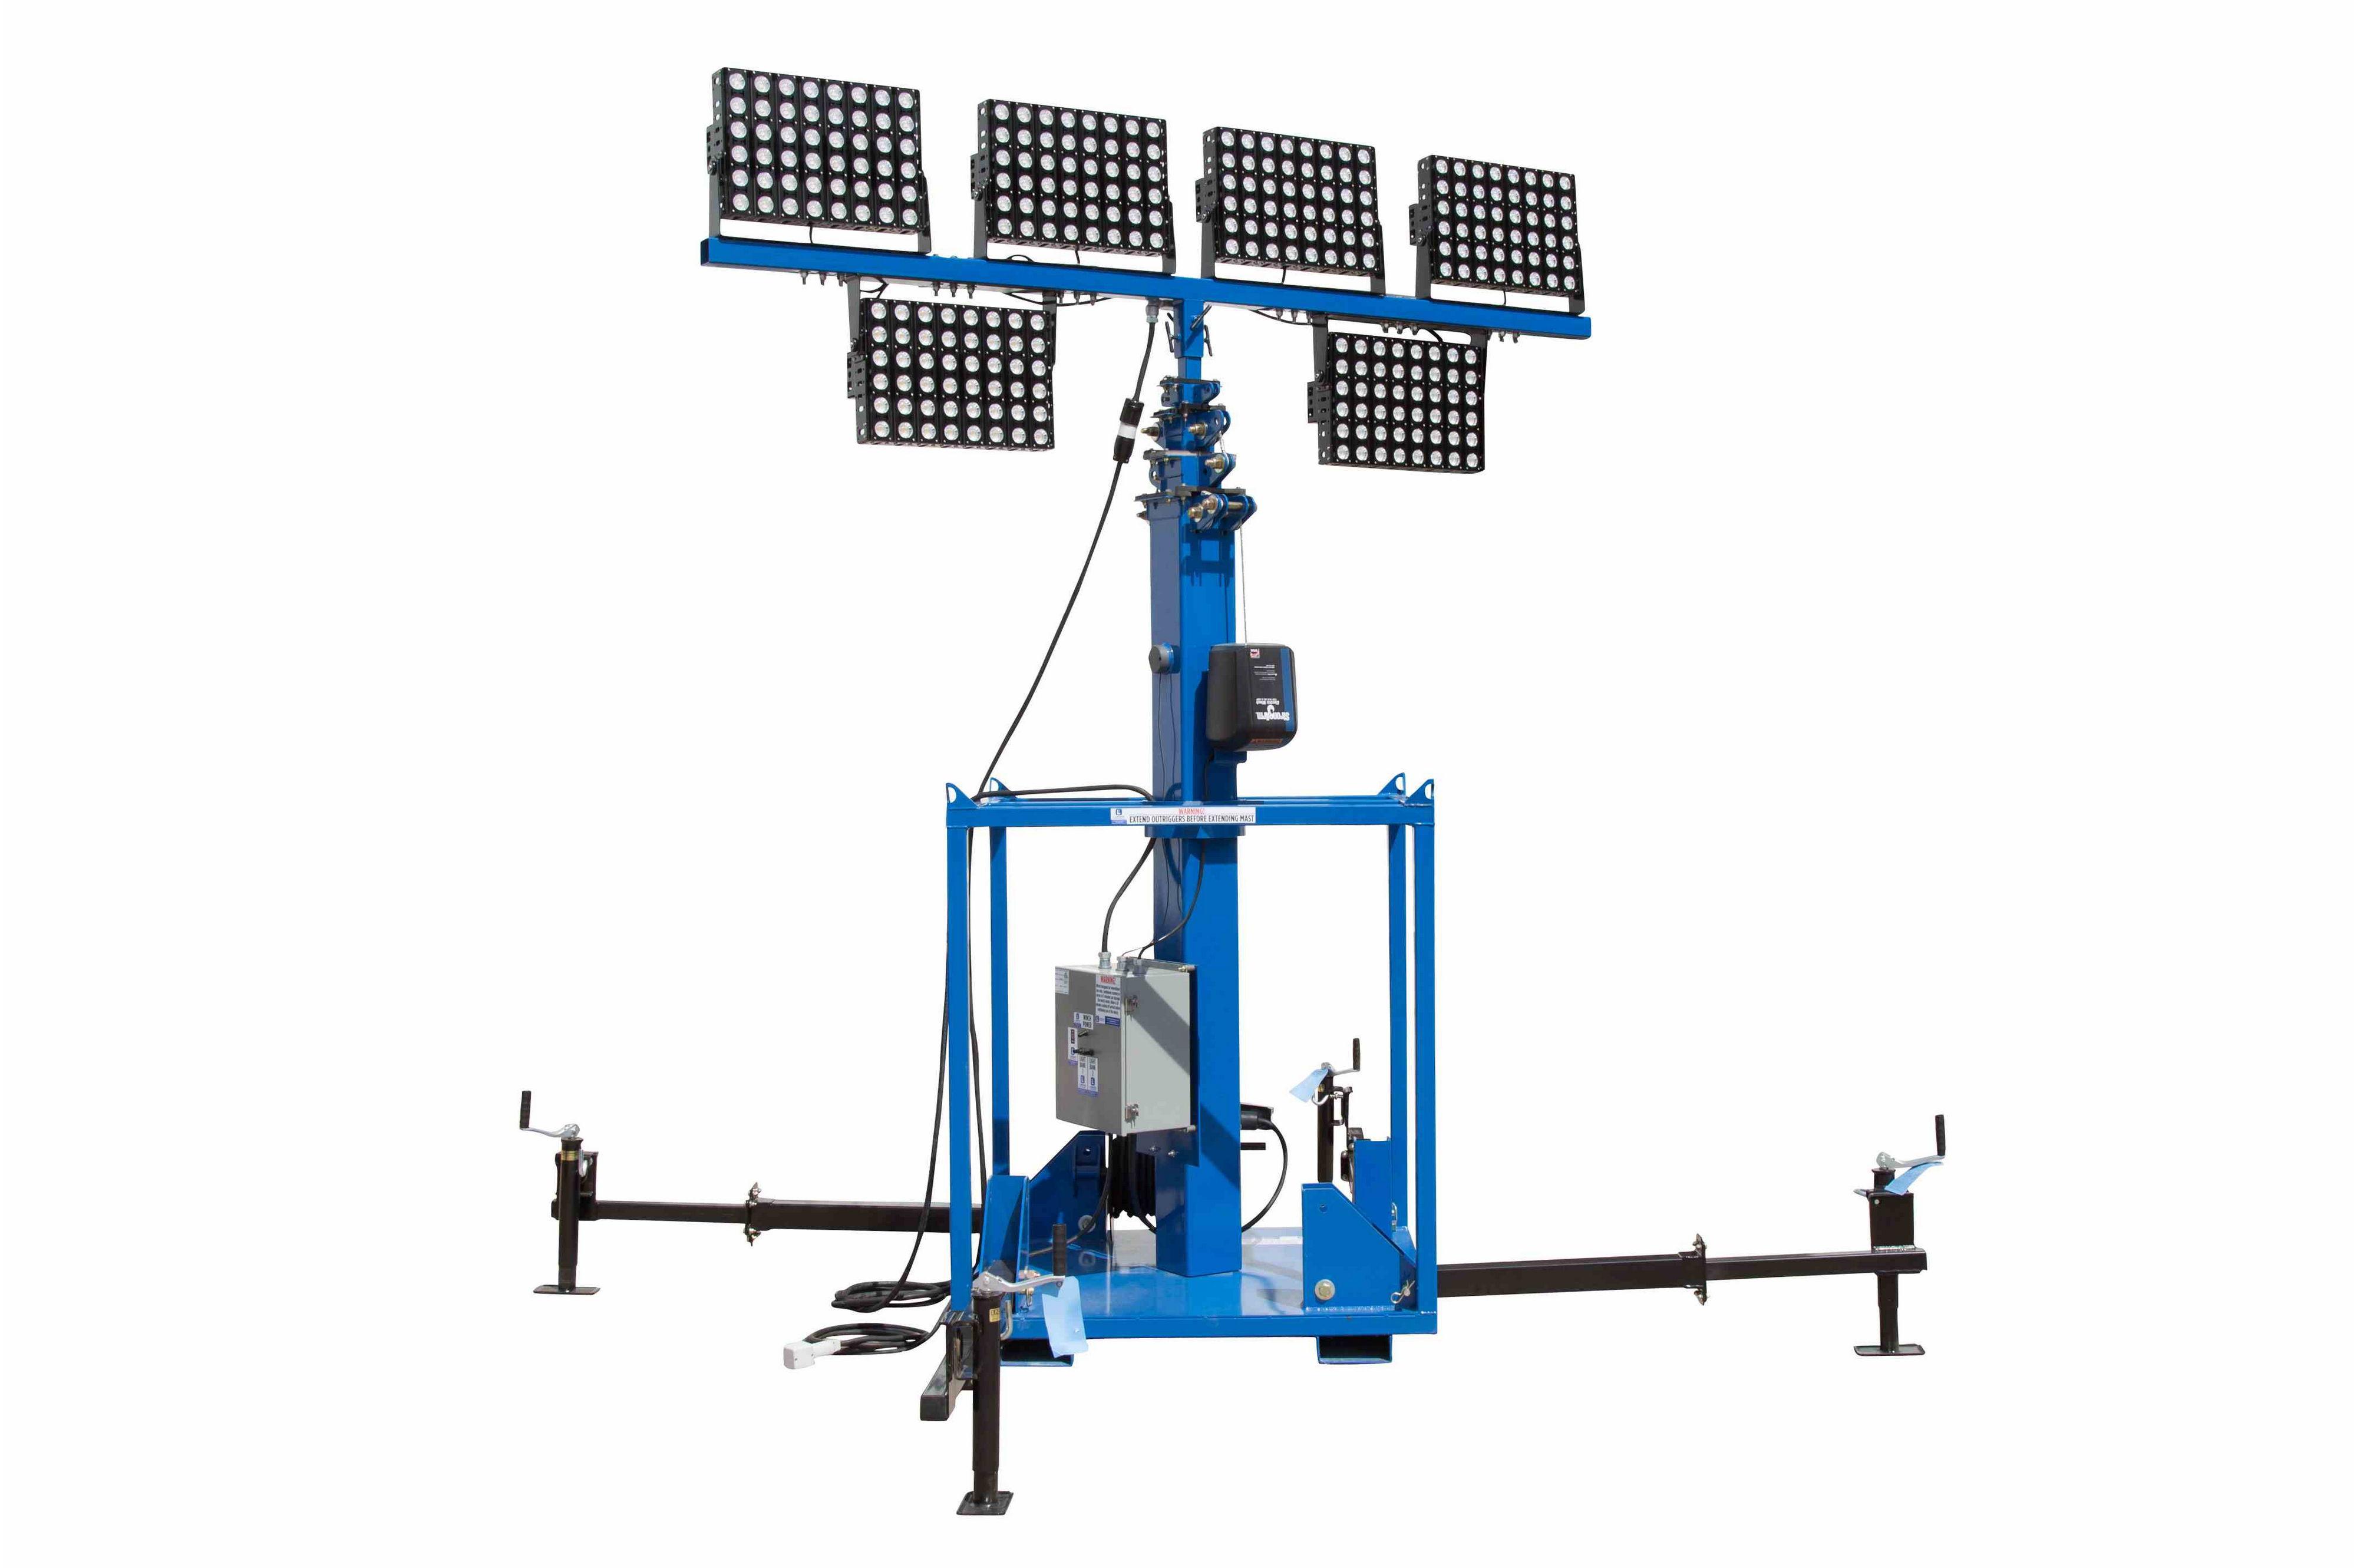 3000 Watt High Intensity Led Light Plant Skid Mount Five Stage 4x4x4 Cube Schematic Strip Lighting Wiring Diagram Hi Res Image 8 2400